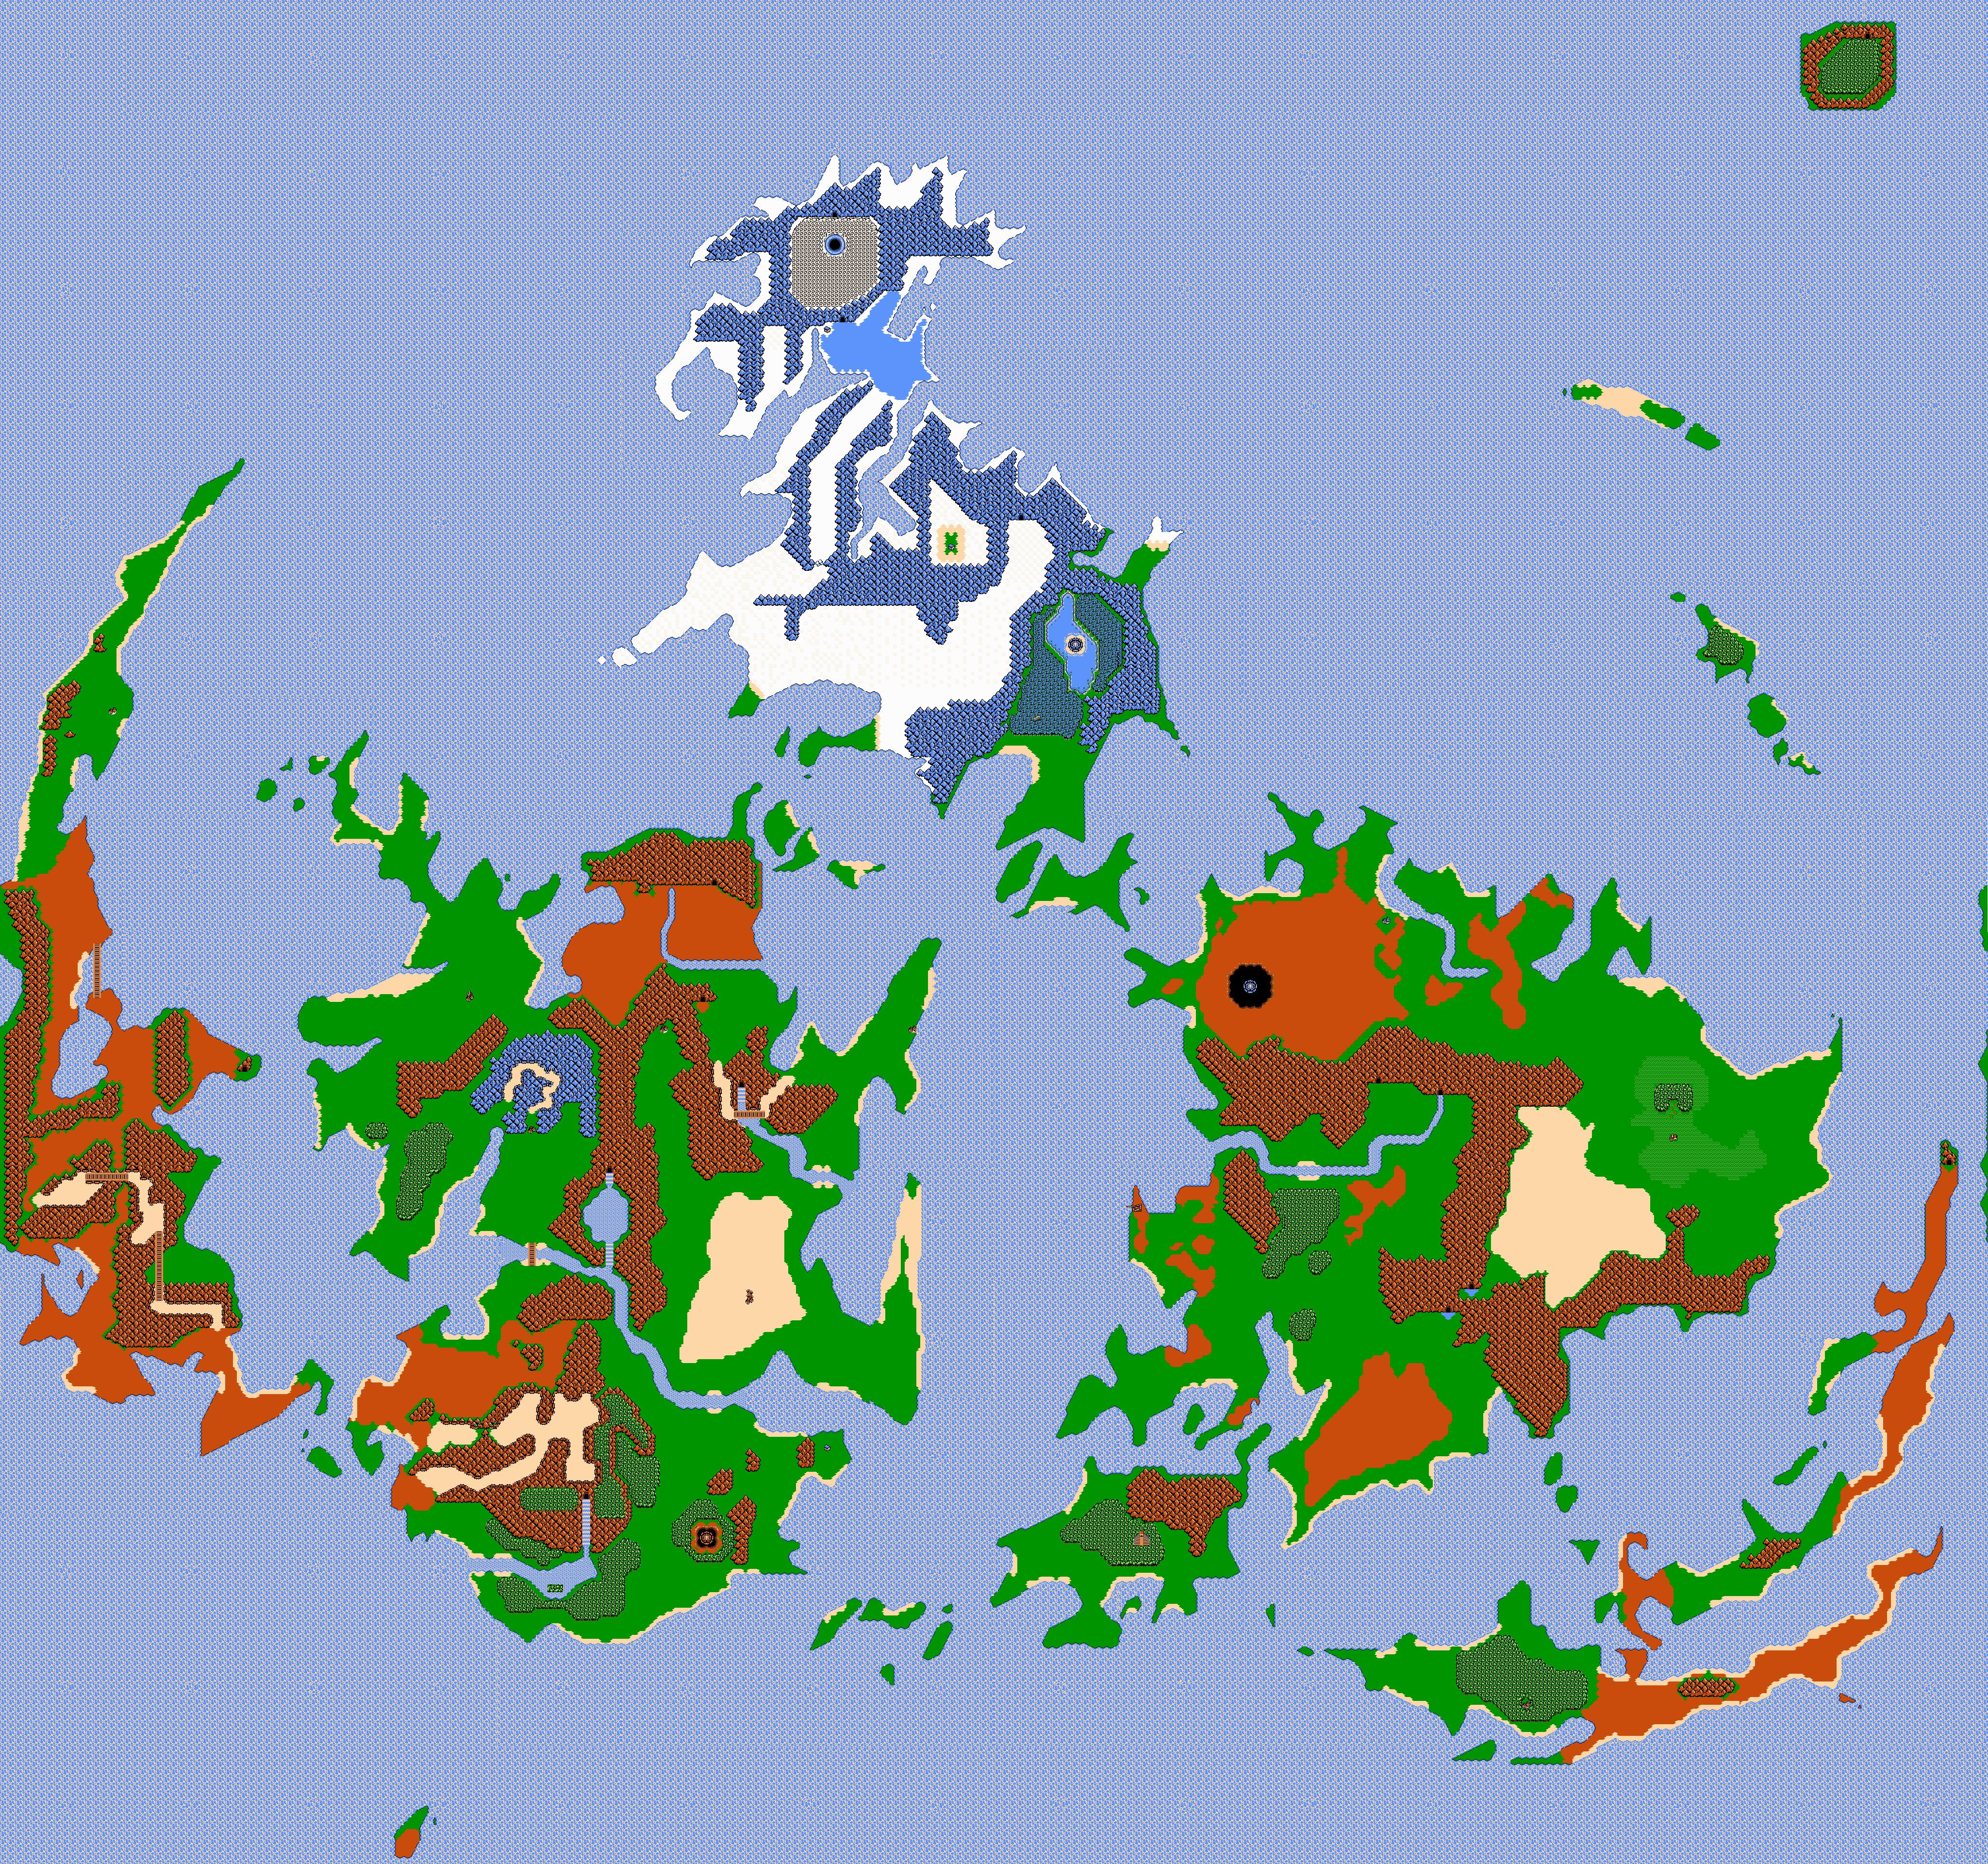 Final Fantasy Vii World Map Nes 8 Bit Styled By Shadowlugia2009 On